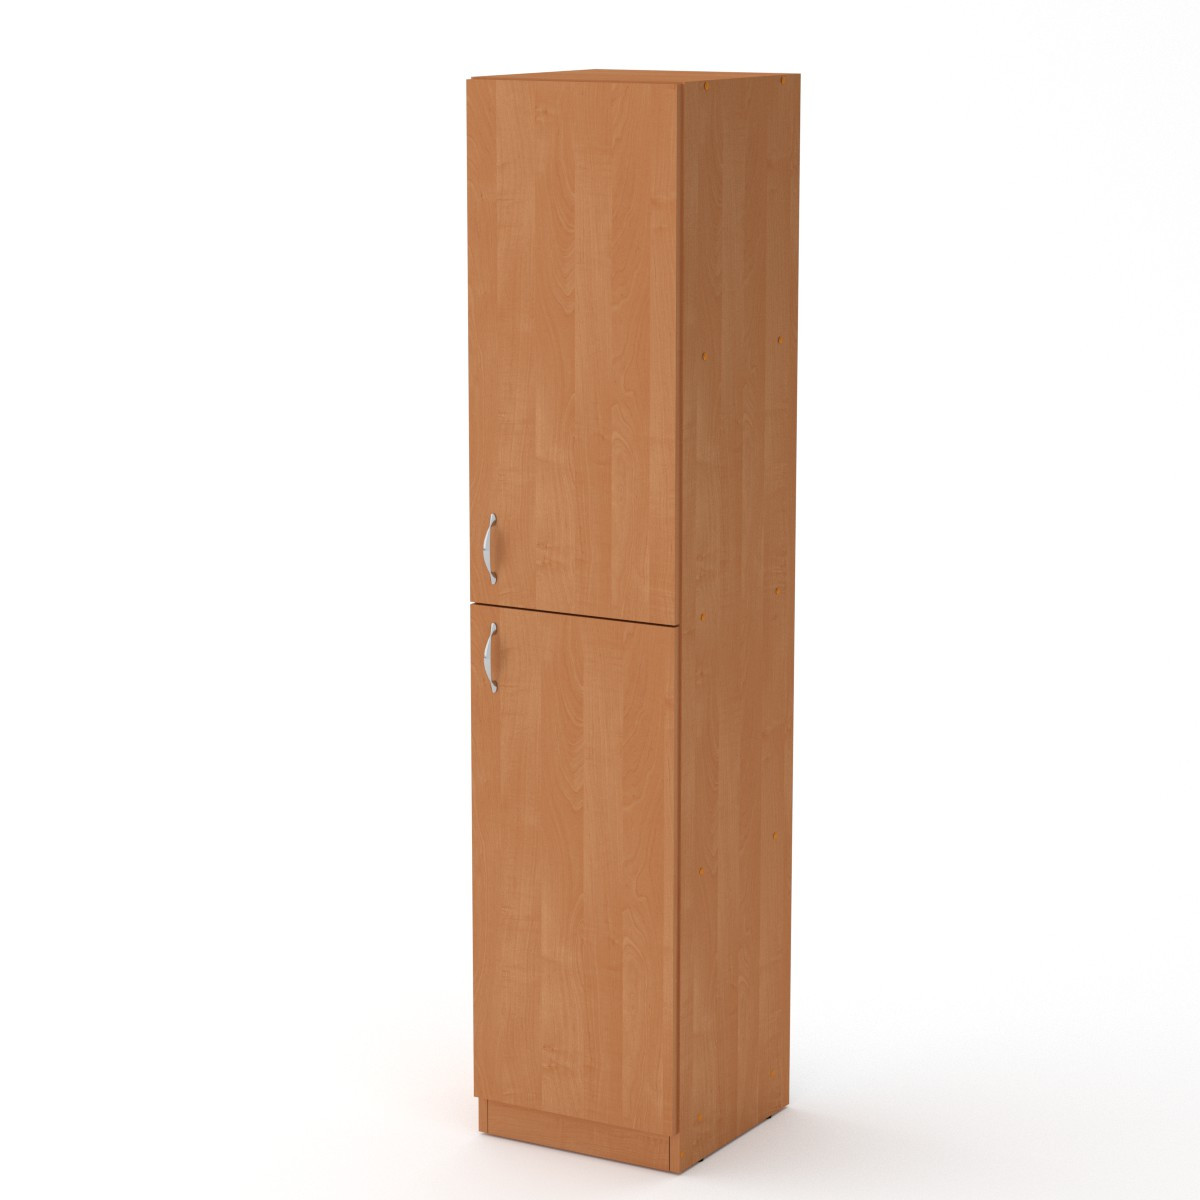 Шкаф книжный КШ-13 ольха Компанит (35х37х159 см)